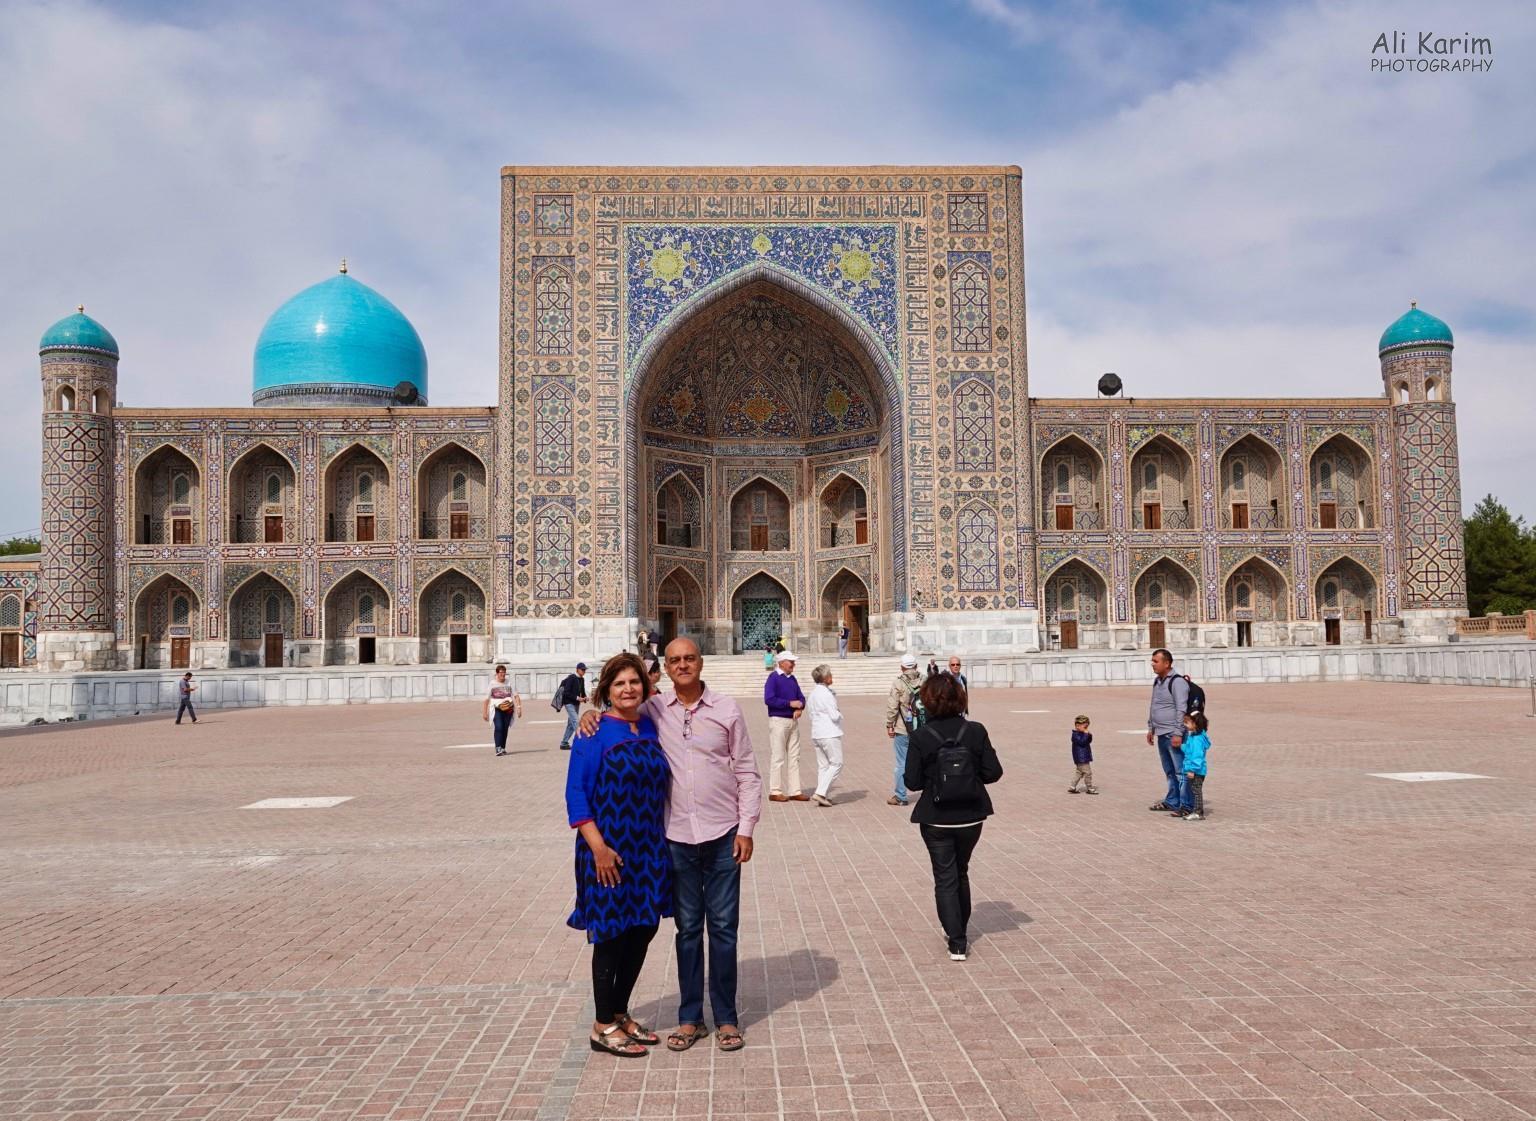 More Samarkand, Obligatory photo in front of the UlughBeg Madrassa